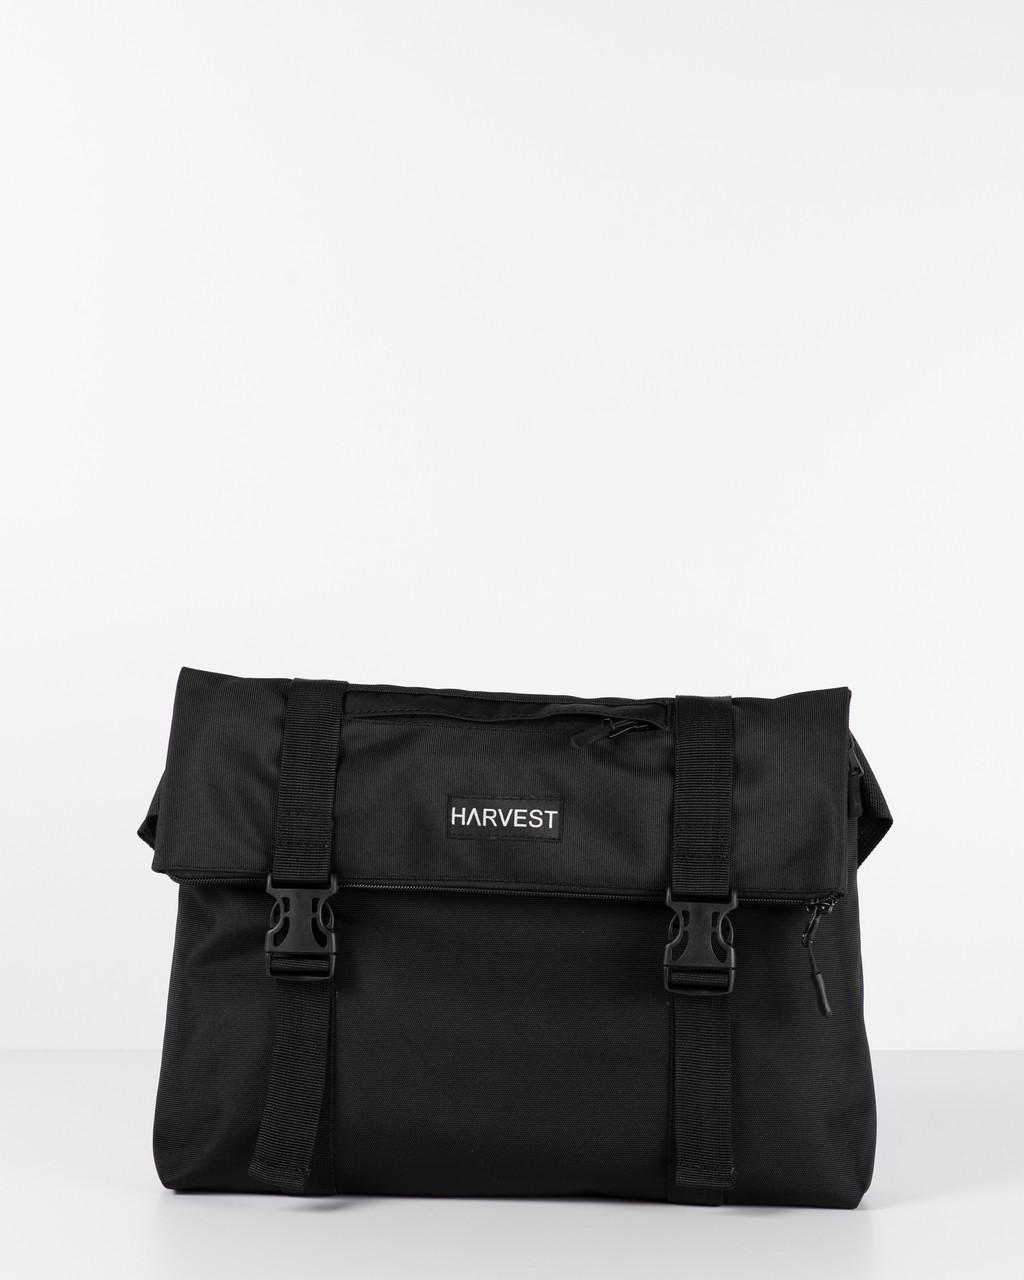 Сумка через плечо мессенджер MES ROLL B HARVEST (мужская сумка, сумка